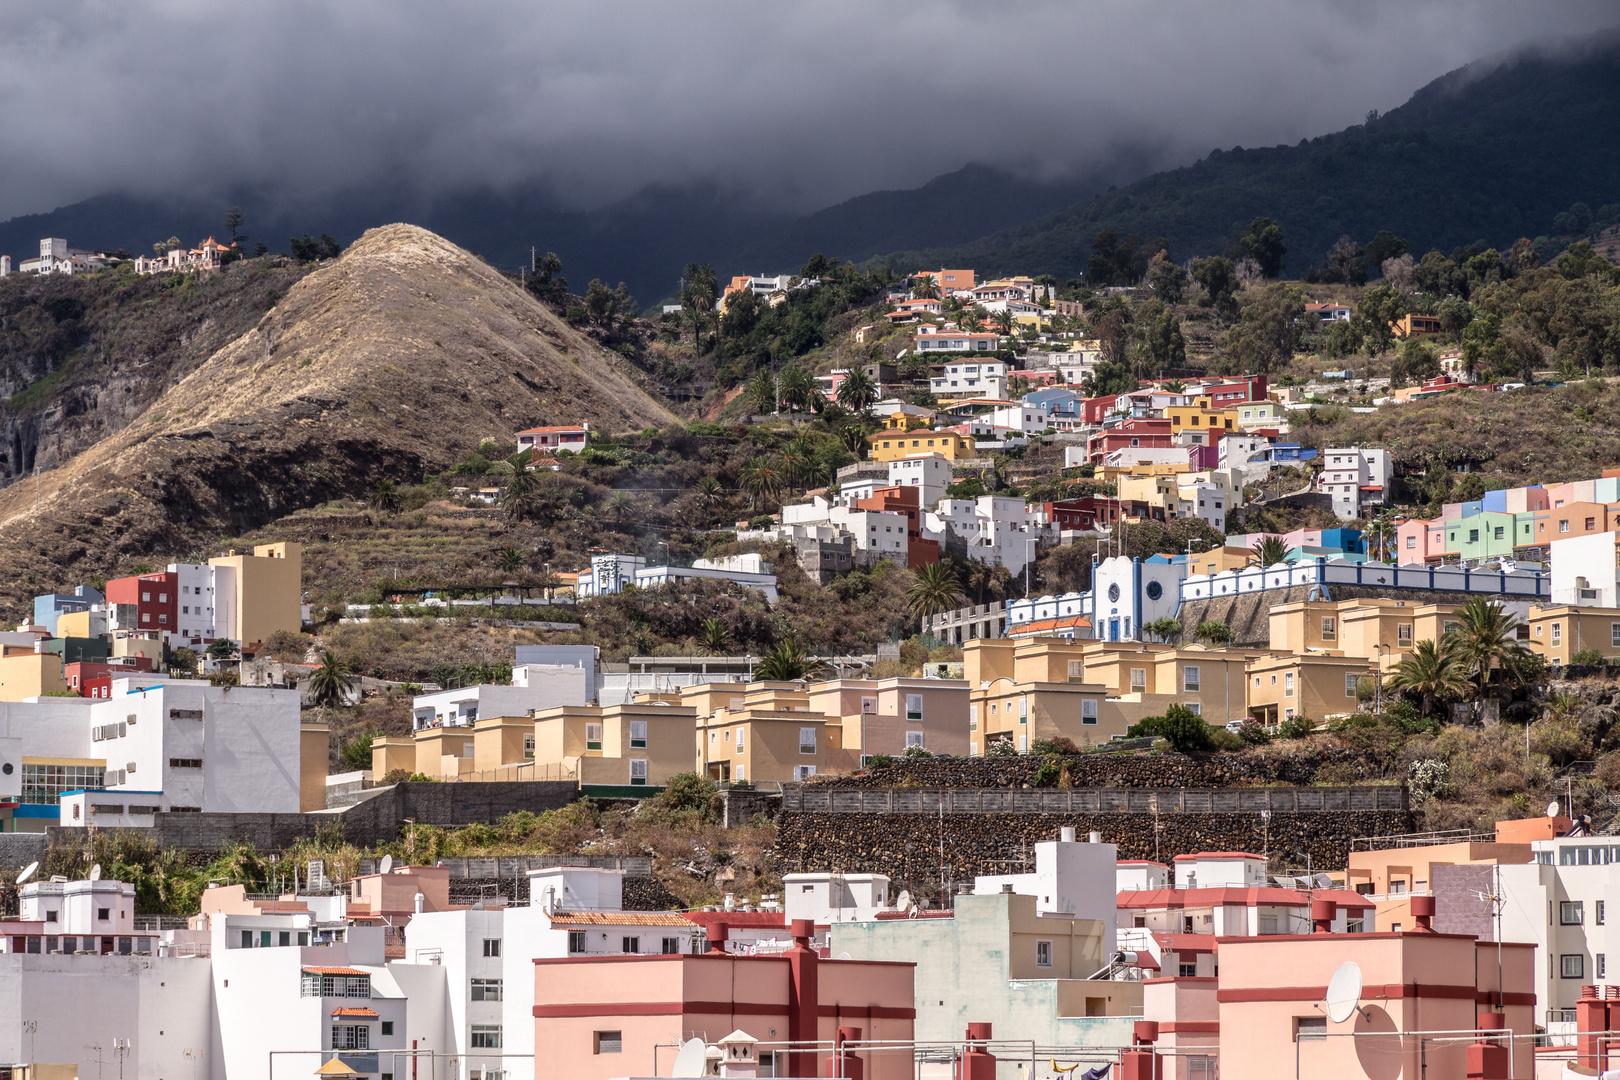 Vom Castillo de la Virgen